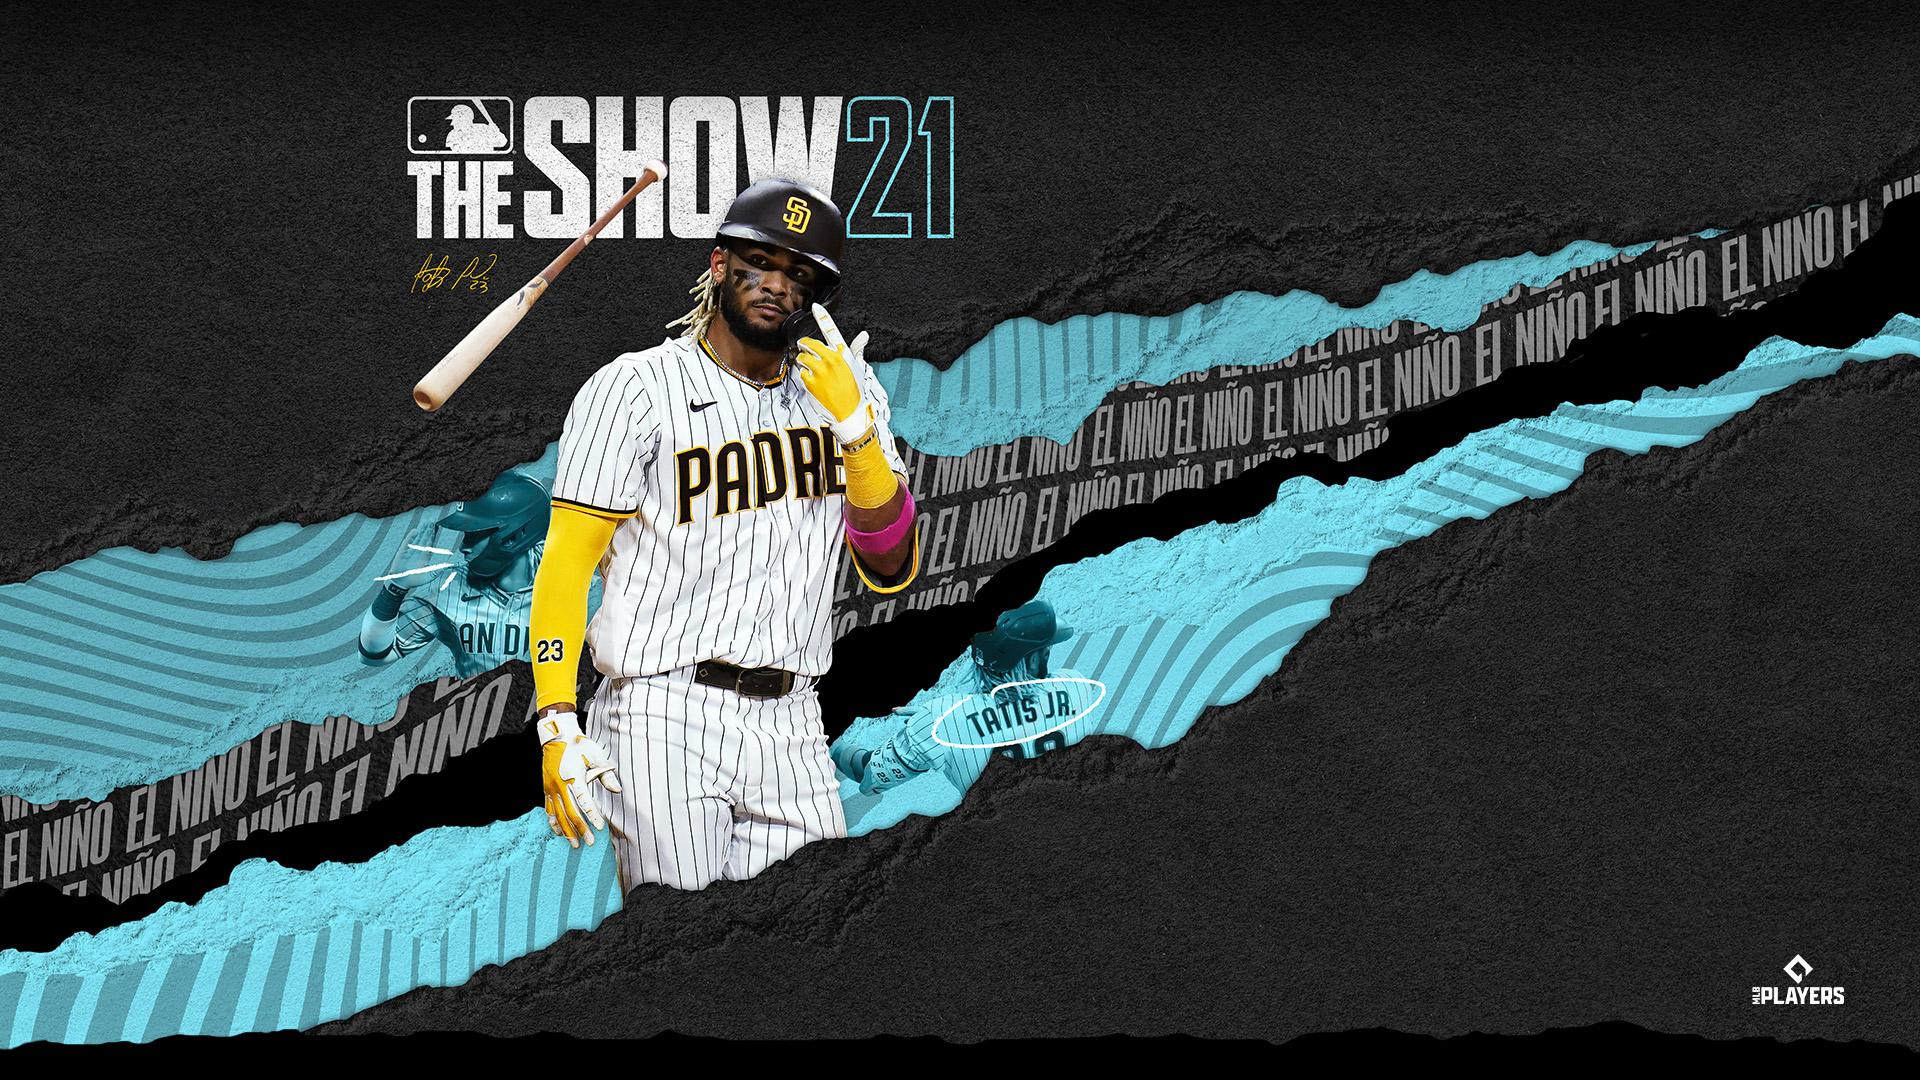 MLB Show 21,聖地牙哥教士隊的 Fernando Tatis Jr. 丟出了他的球棒,角落有一個 MLB 球員標誌。